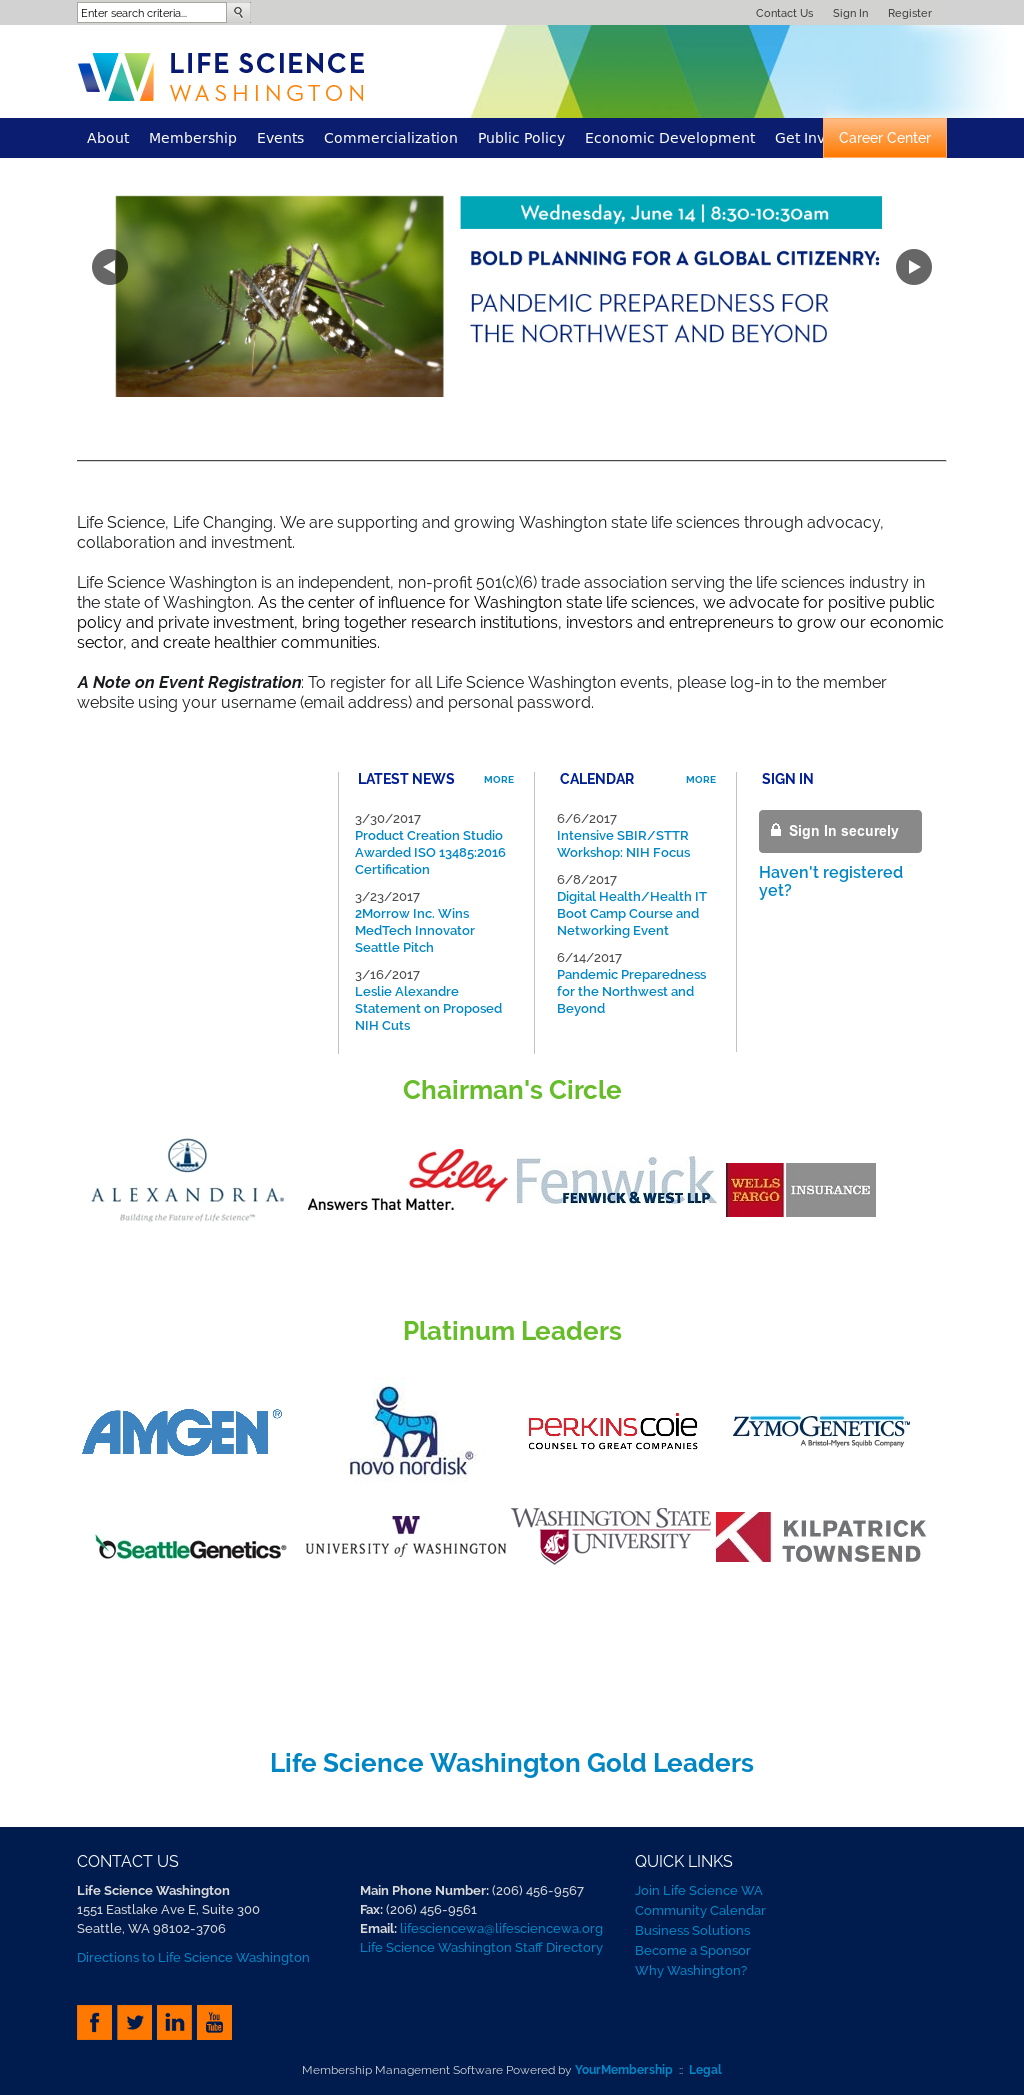 WBBA Competitors, Revenue and Employees - Owler Company Profile